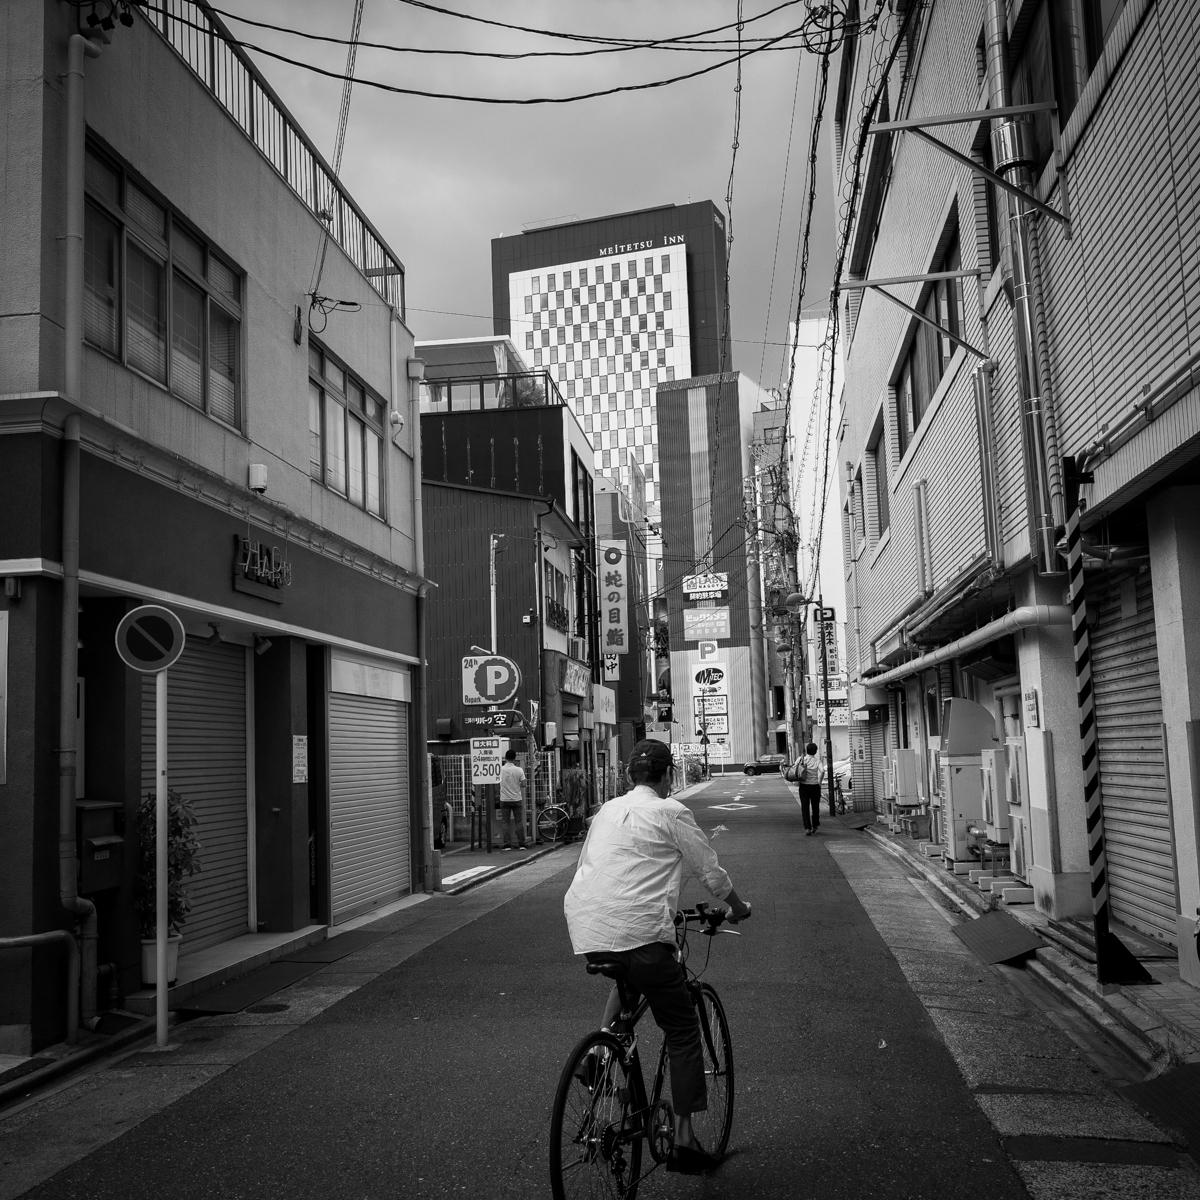 f:id:nagoya-meshi:20190526214403j:plain